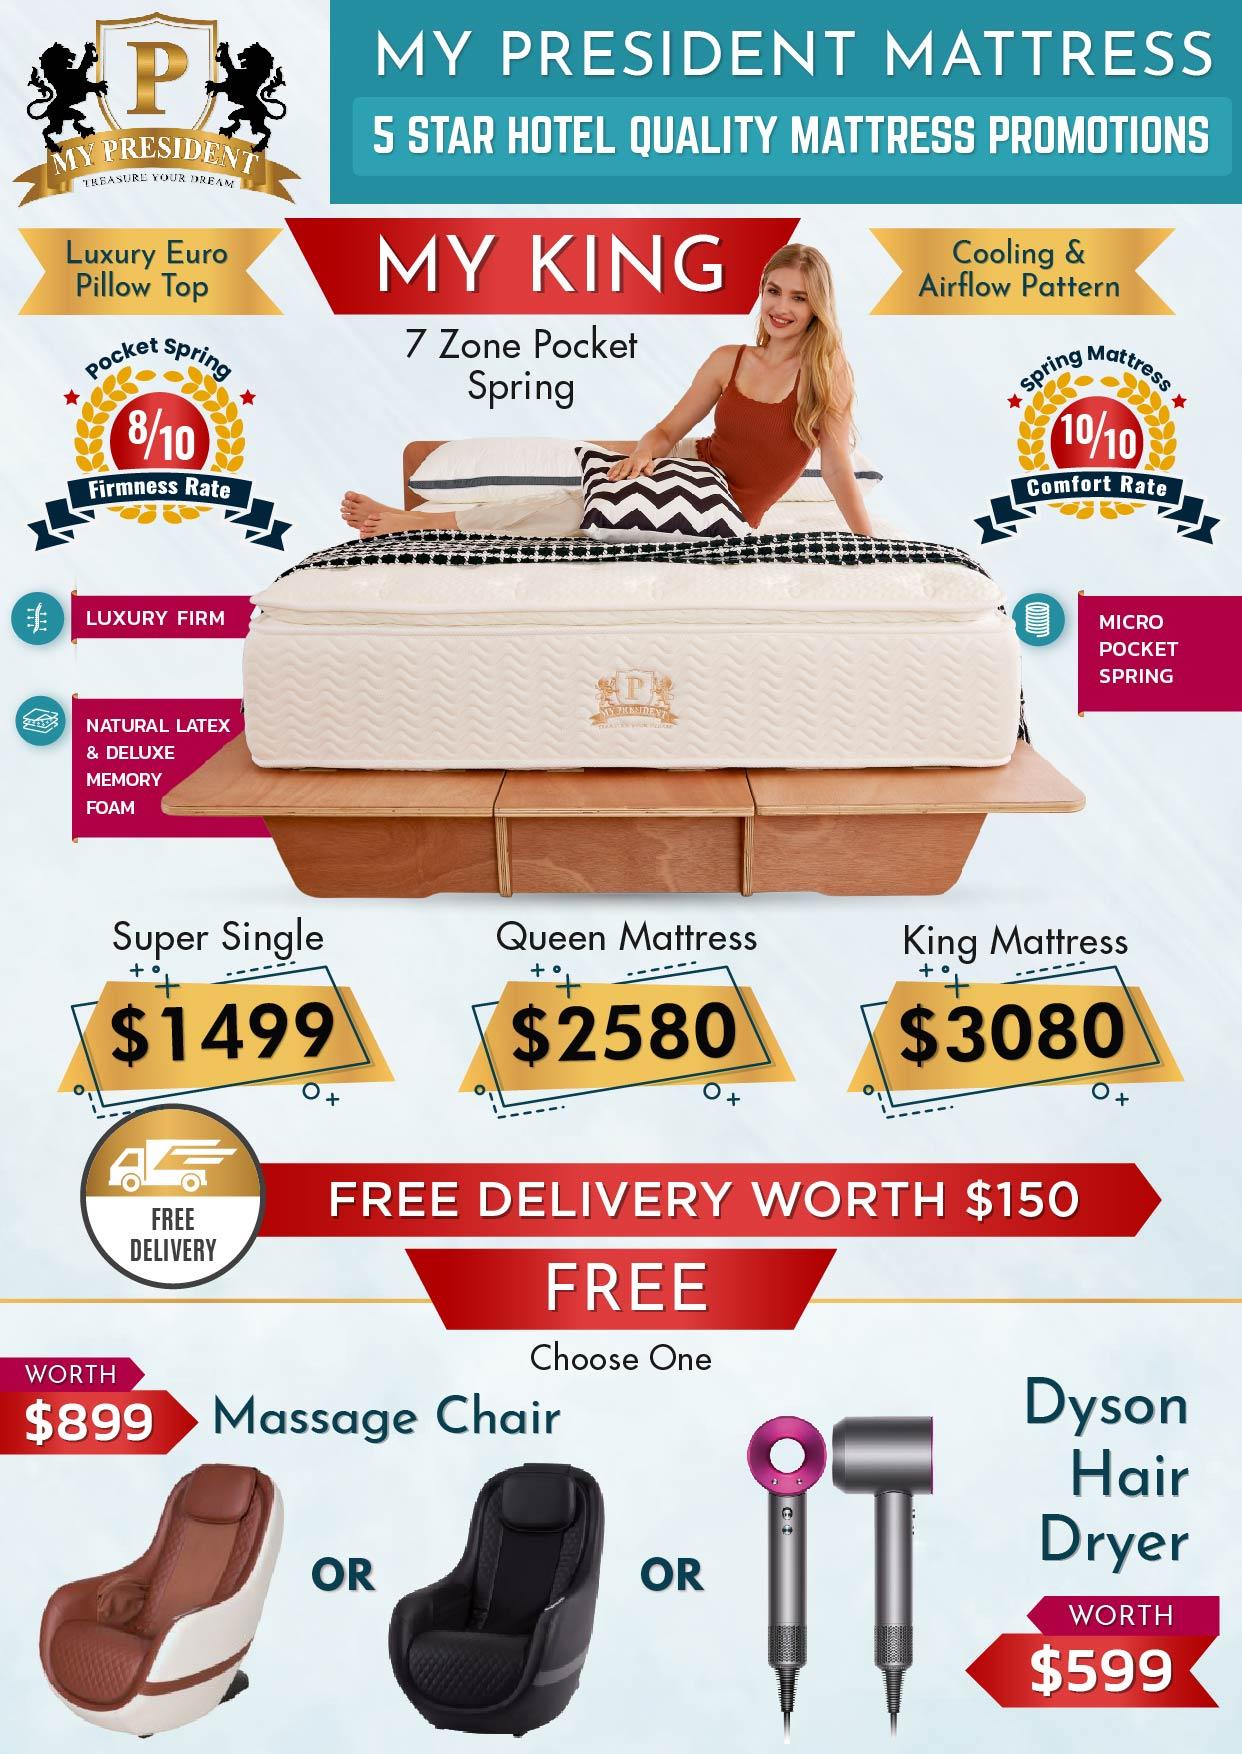 My King 5 Star Hotel Quality Mattress